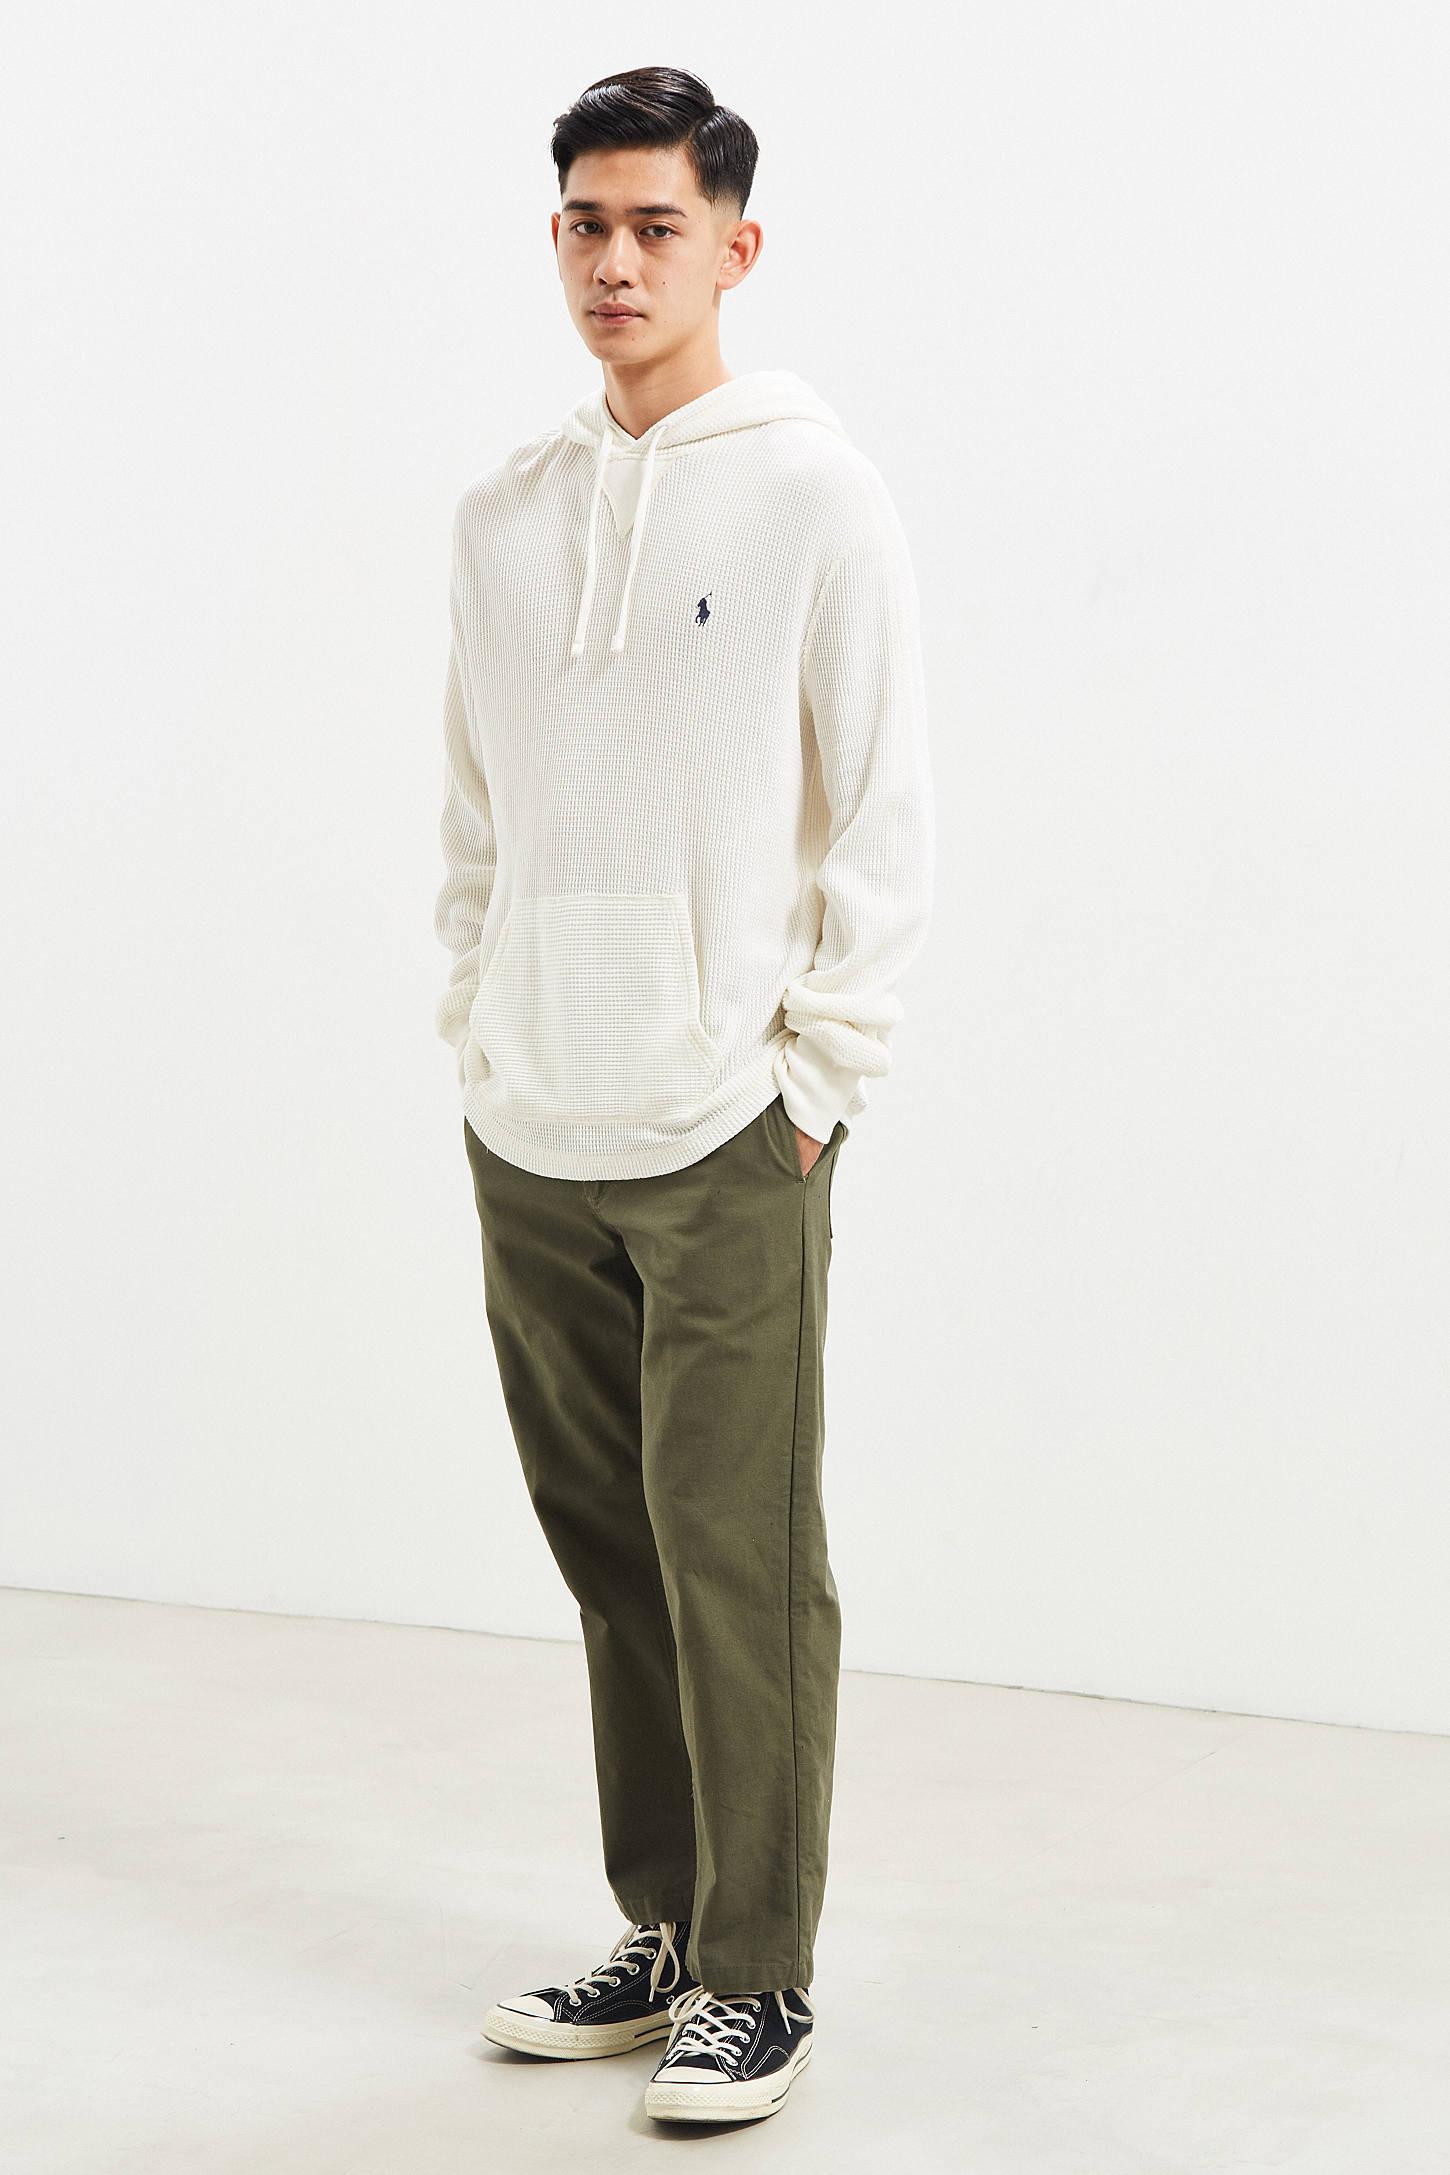 Polo Ralph Lauren Waffle Hooded Long Sleeve Shirt | Urban Outfitters